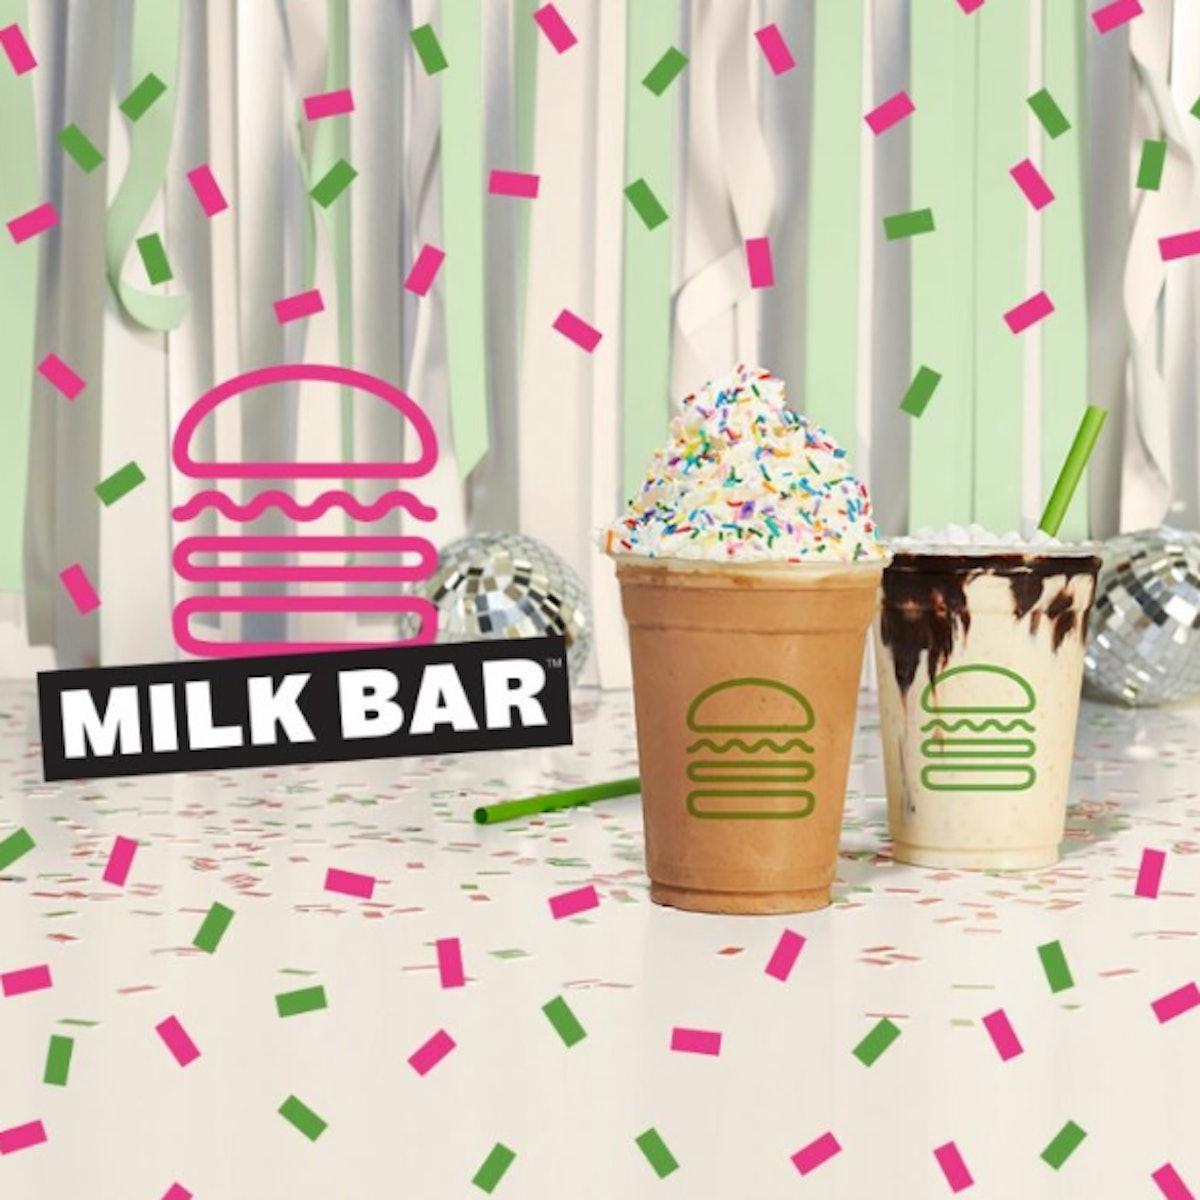 Shake Shack's new collaboration with Milk Bar includes birthday cake milkshakes.